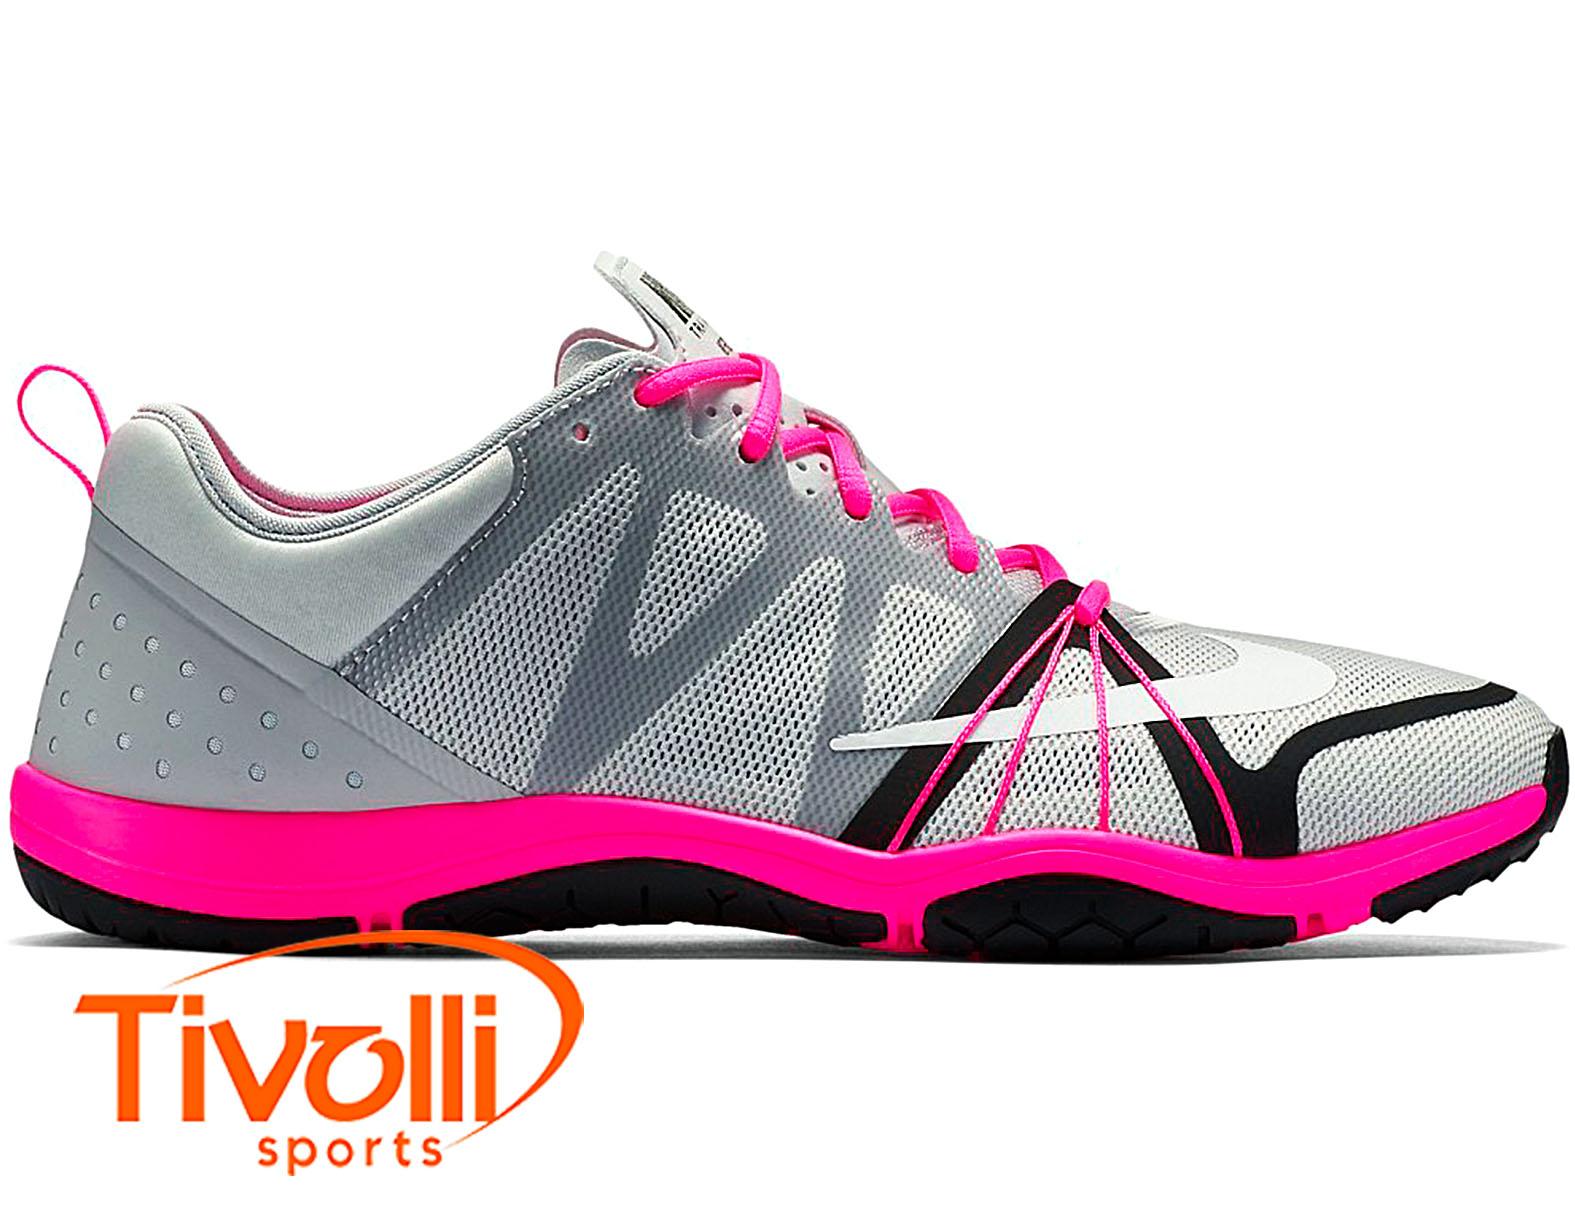 Tênis Nike Free Cross Compete Feminino Cinza Rosa E Preto